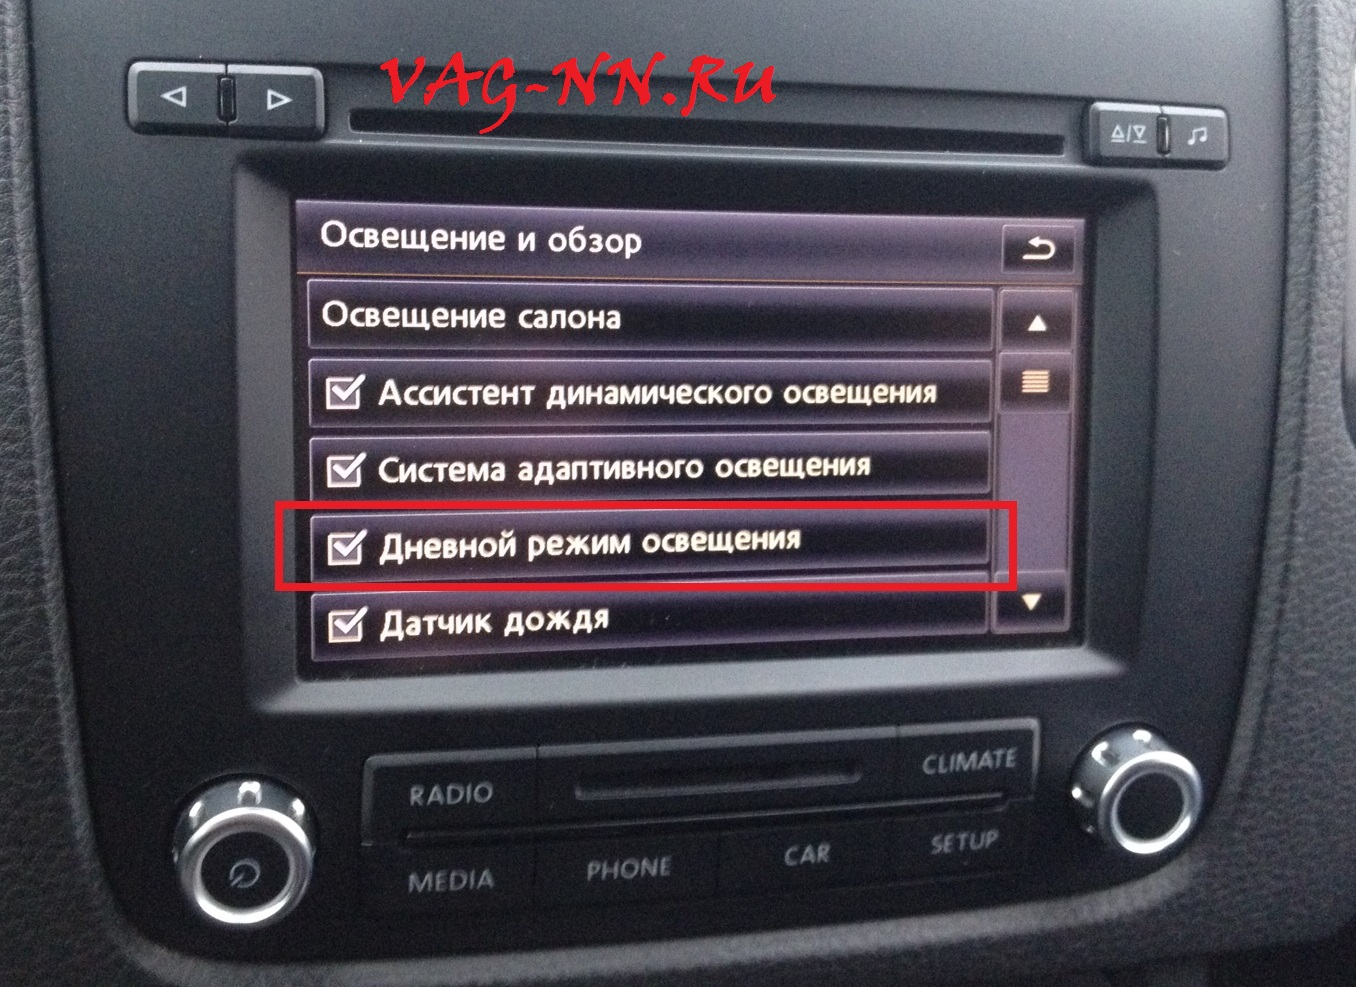 меню ДХО на РНС 850